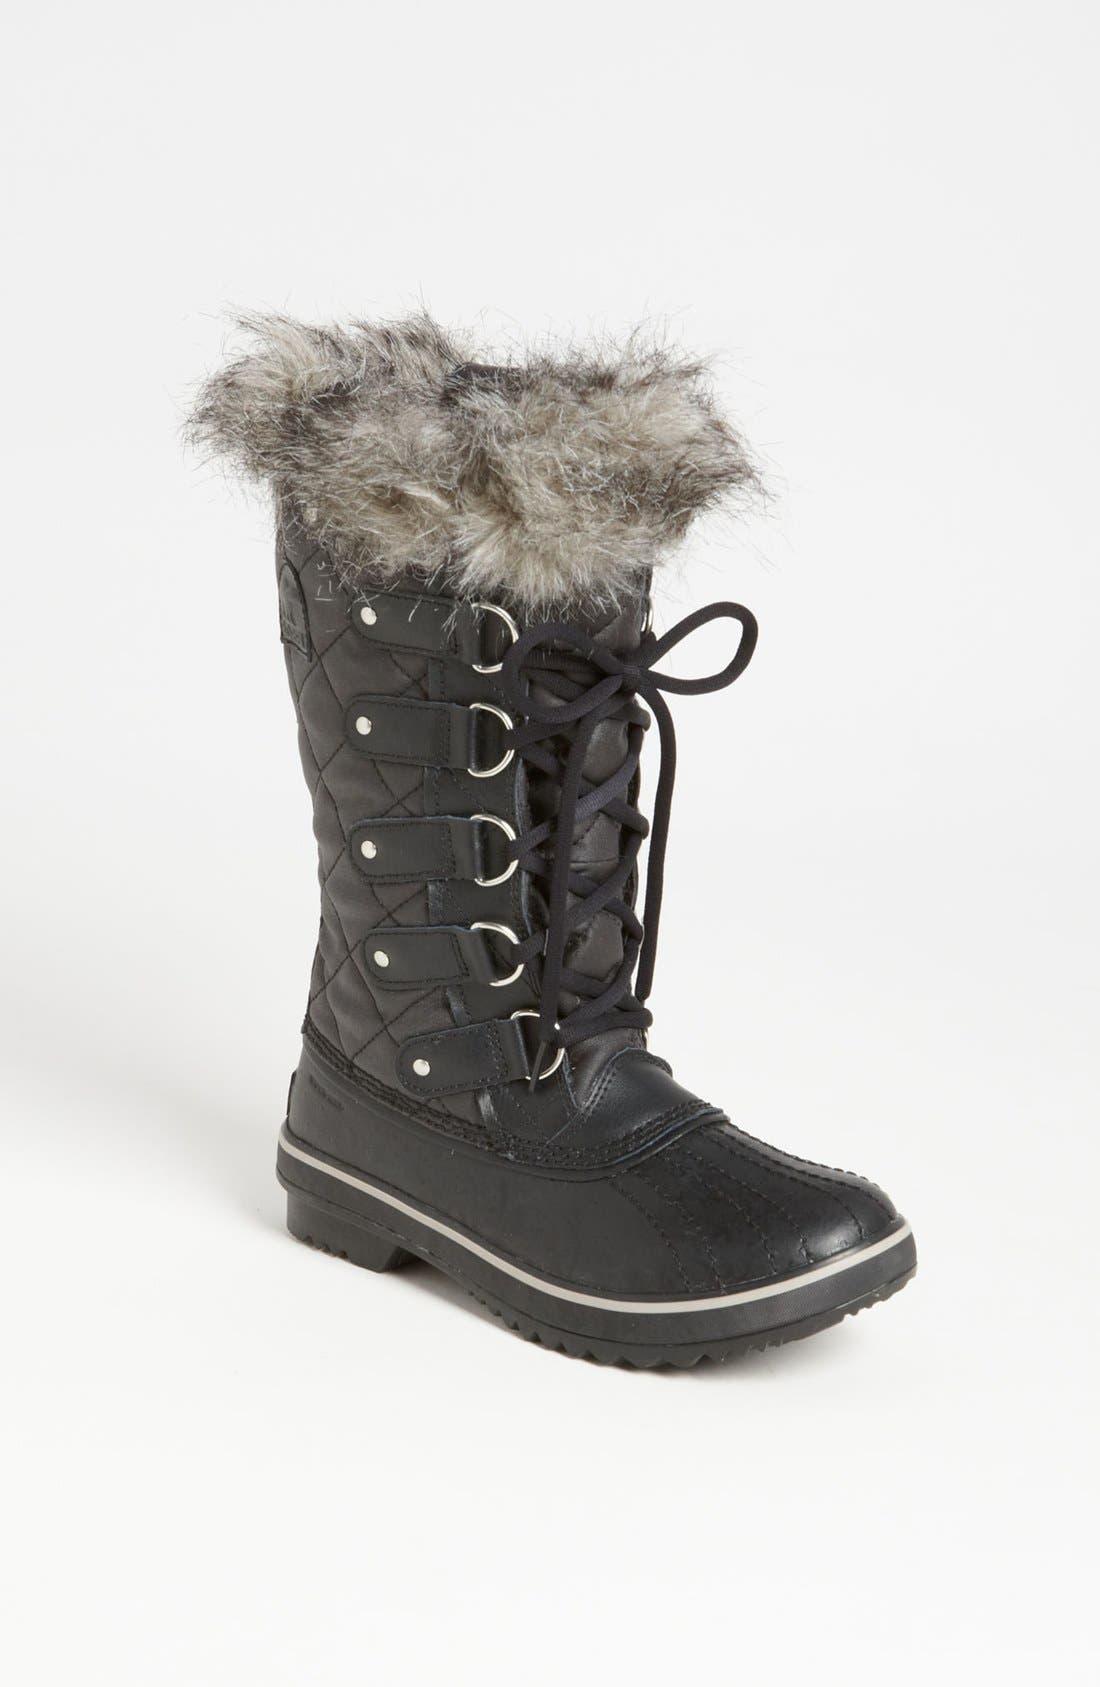 Main Image - SOREL 'Tofino' Boot